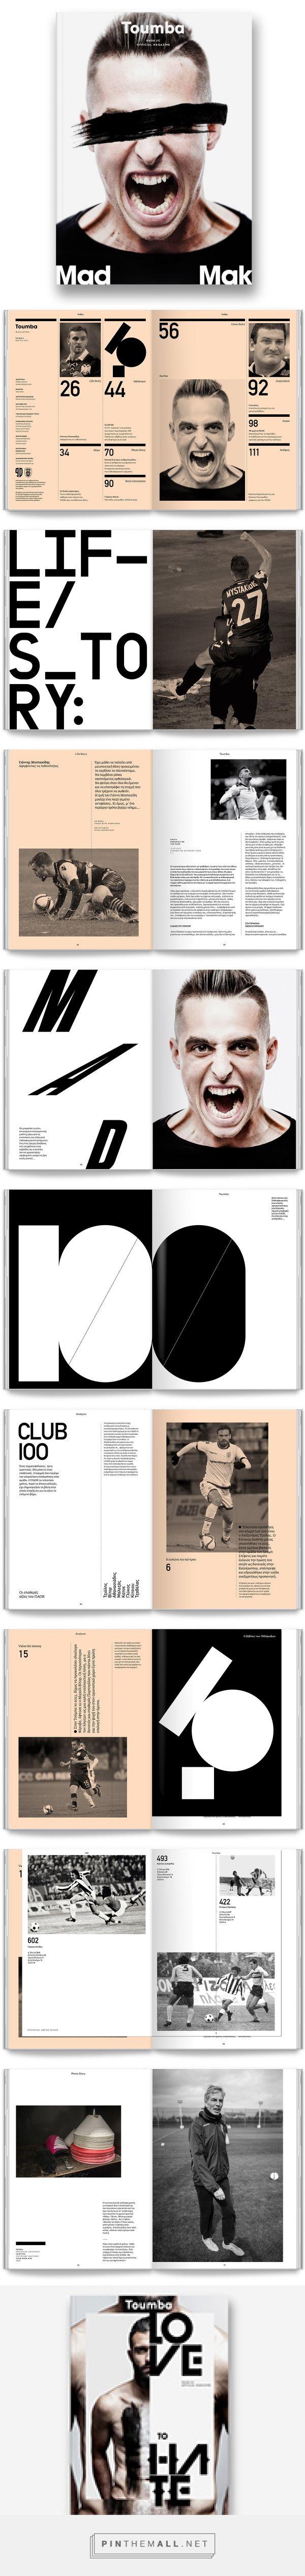 Toumba Magazine / Issue 3 on Behance - created via https://pinthemall.net